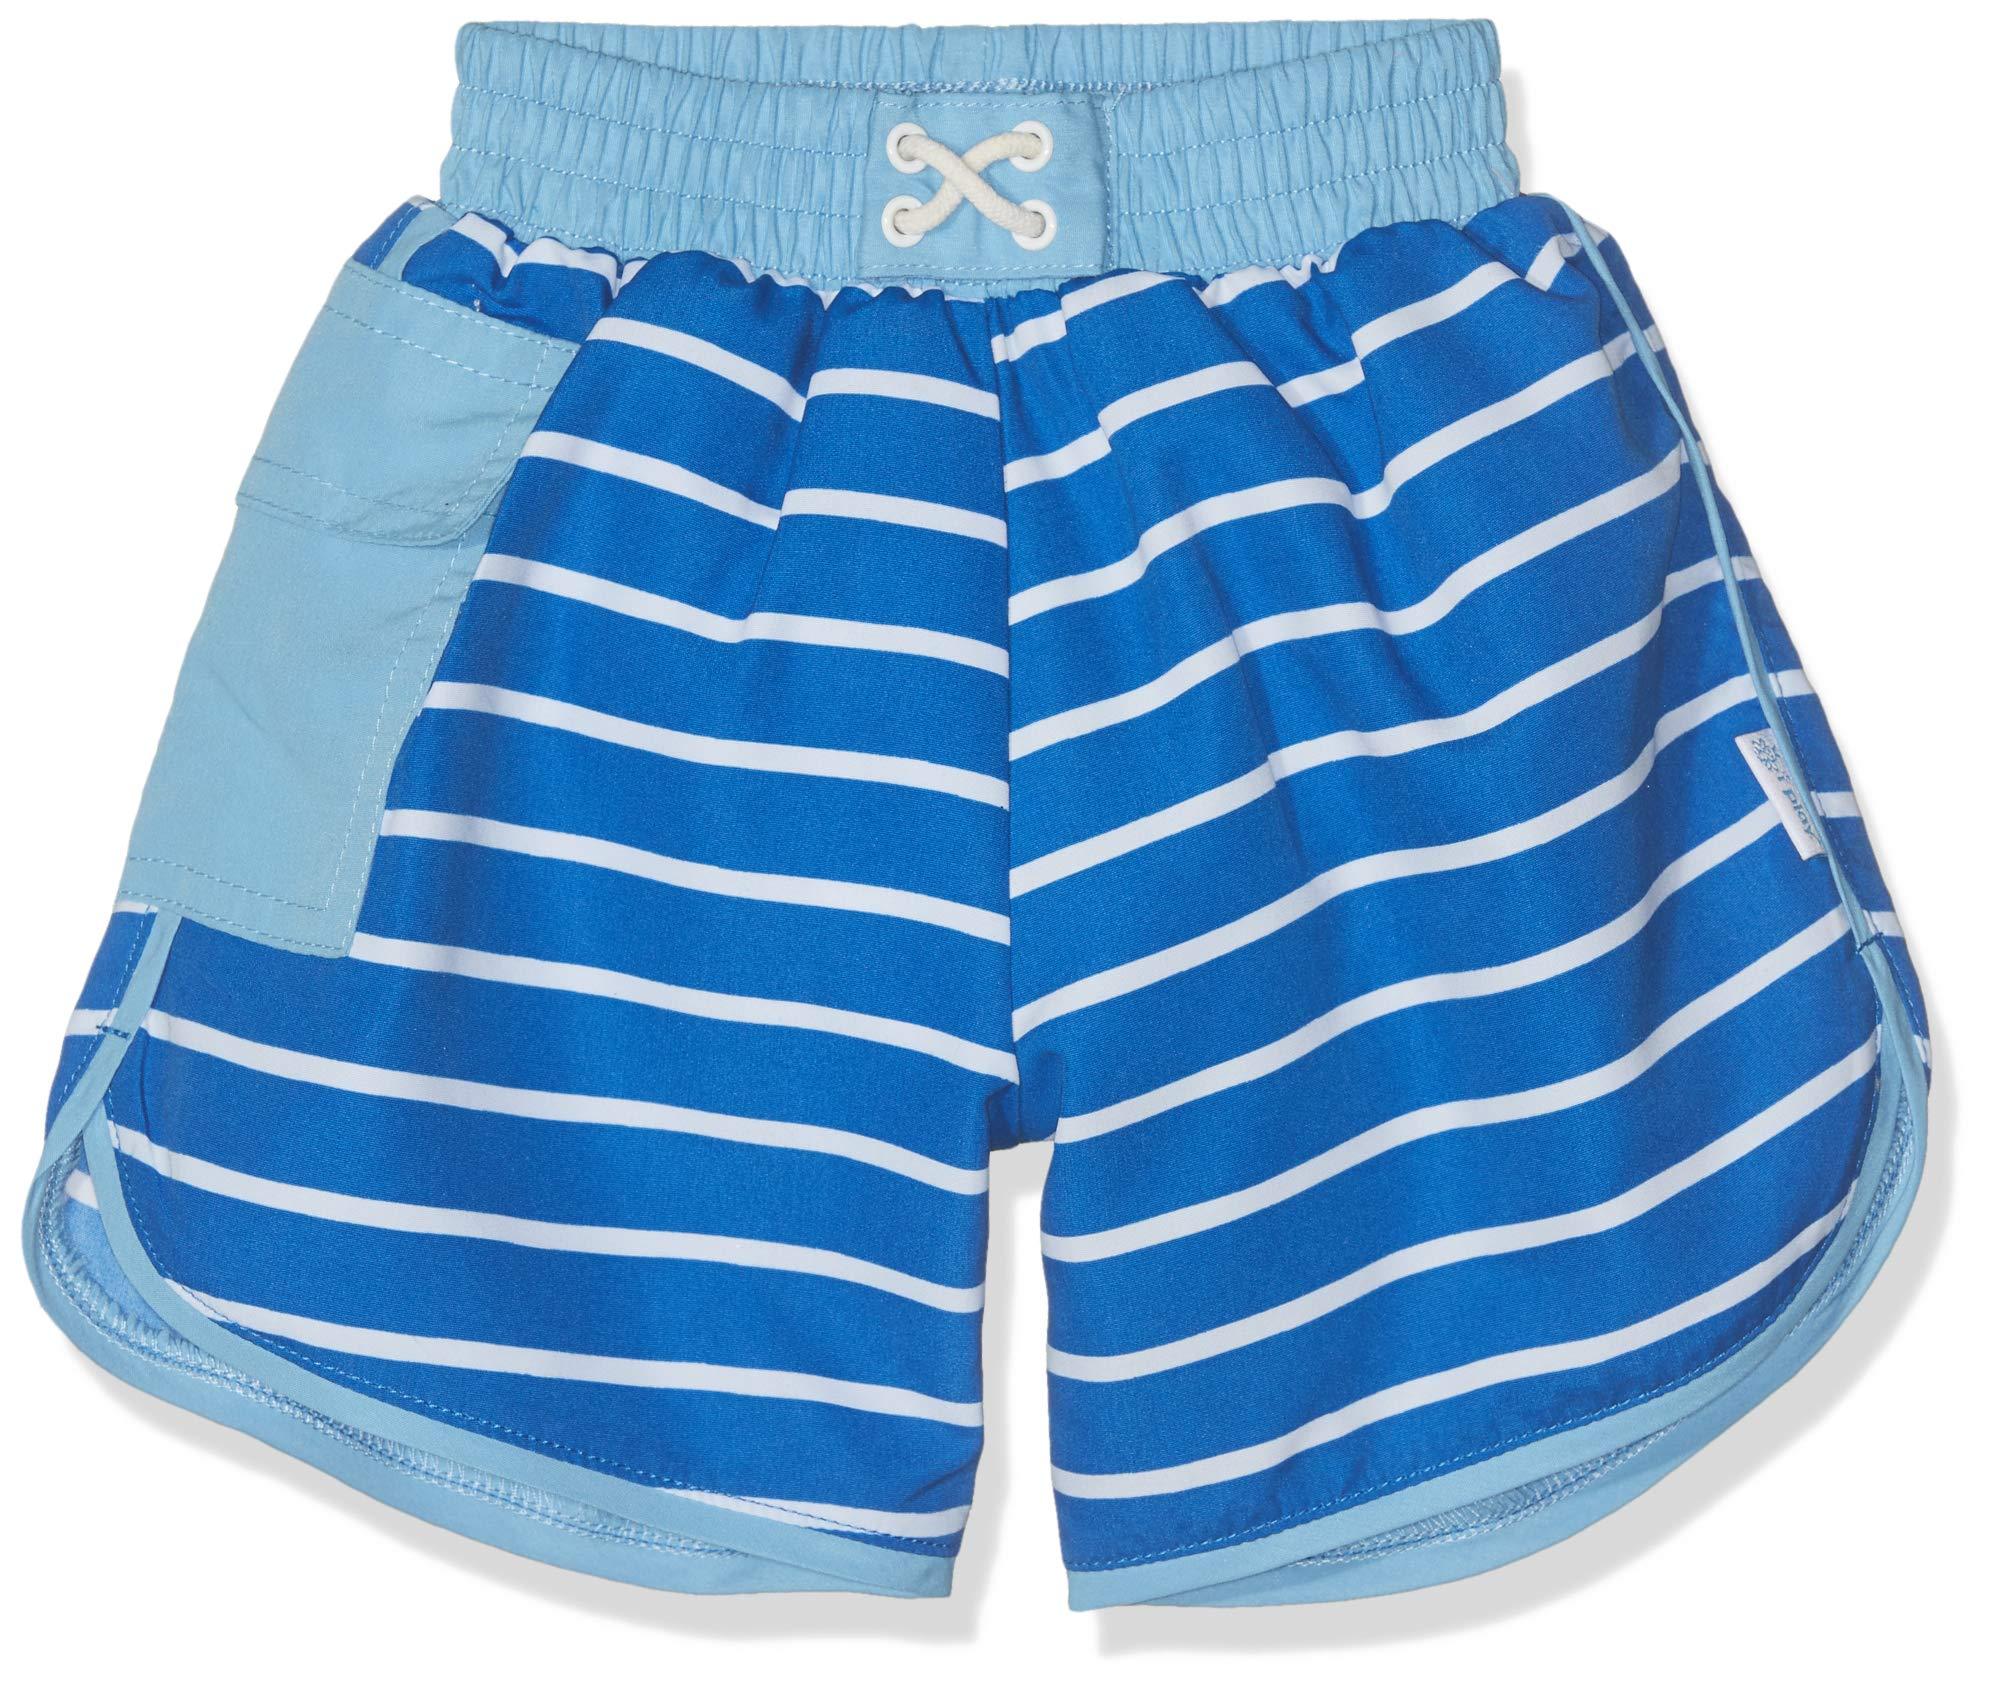 0335519817 Best Rated in Baby Boys' Swim Trunks & Shorts & Helpful Customer ...